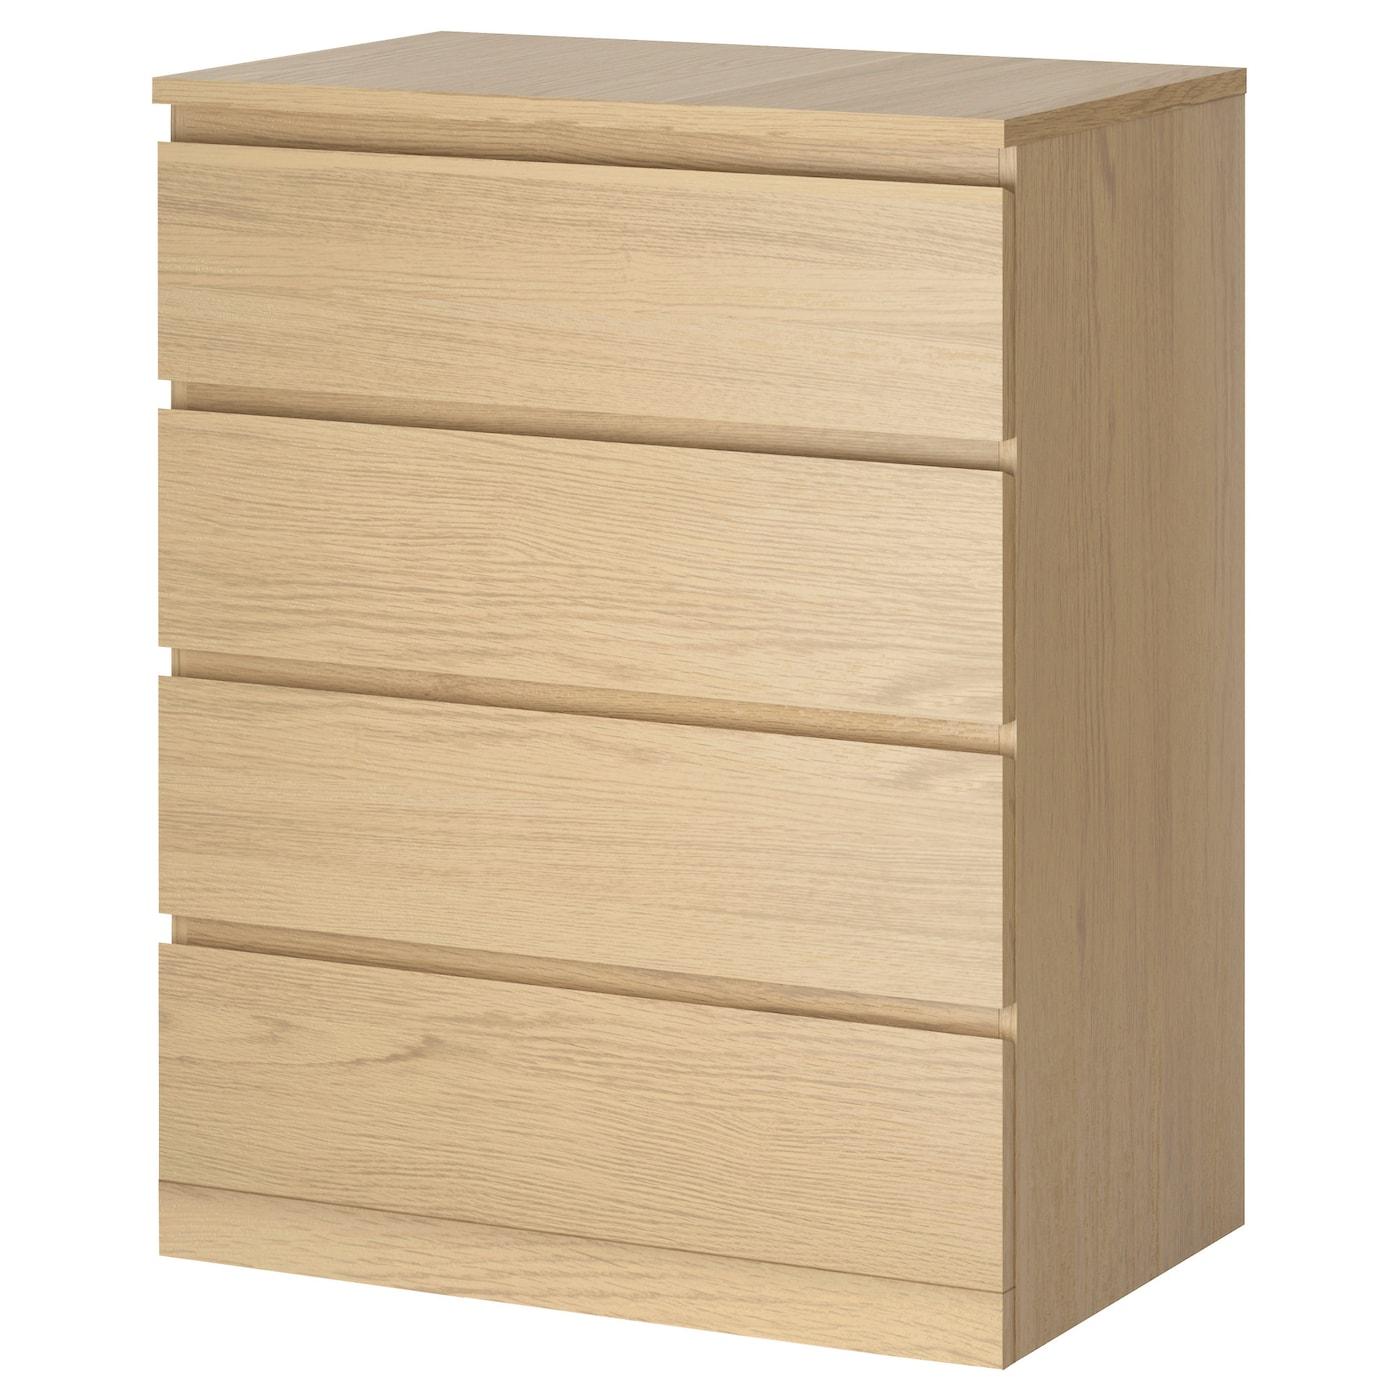 MALM - 4-drawer chest, white stained oak veneer